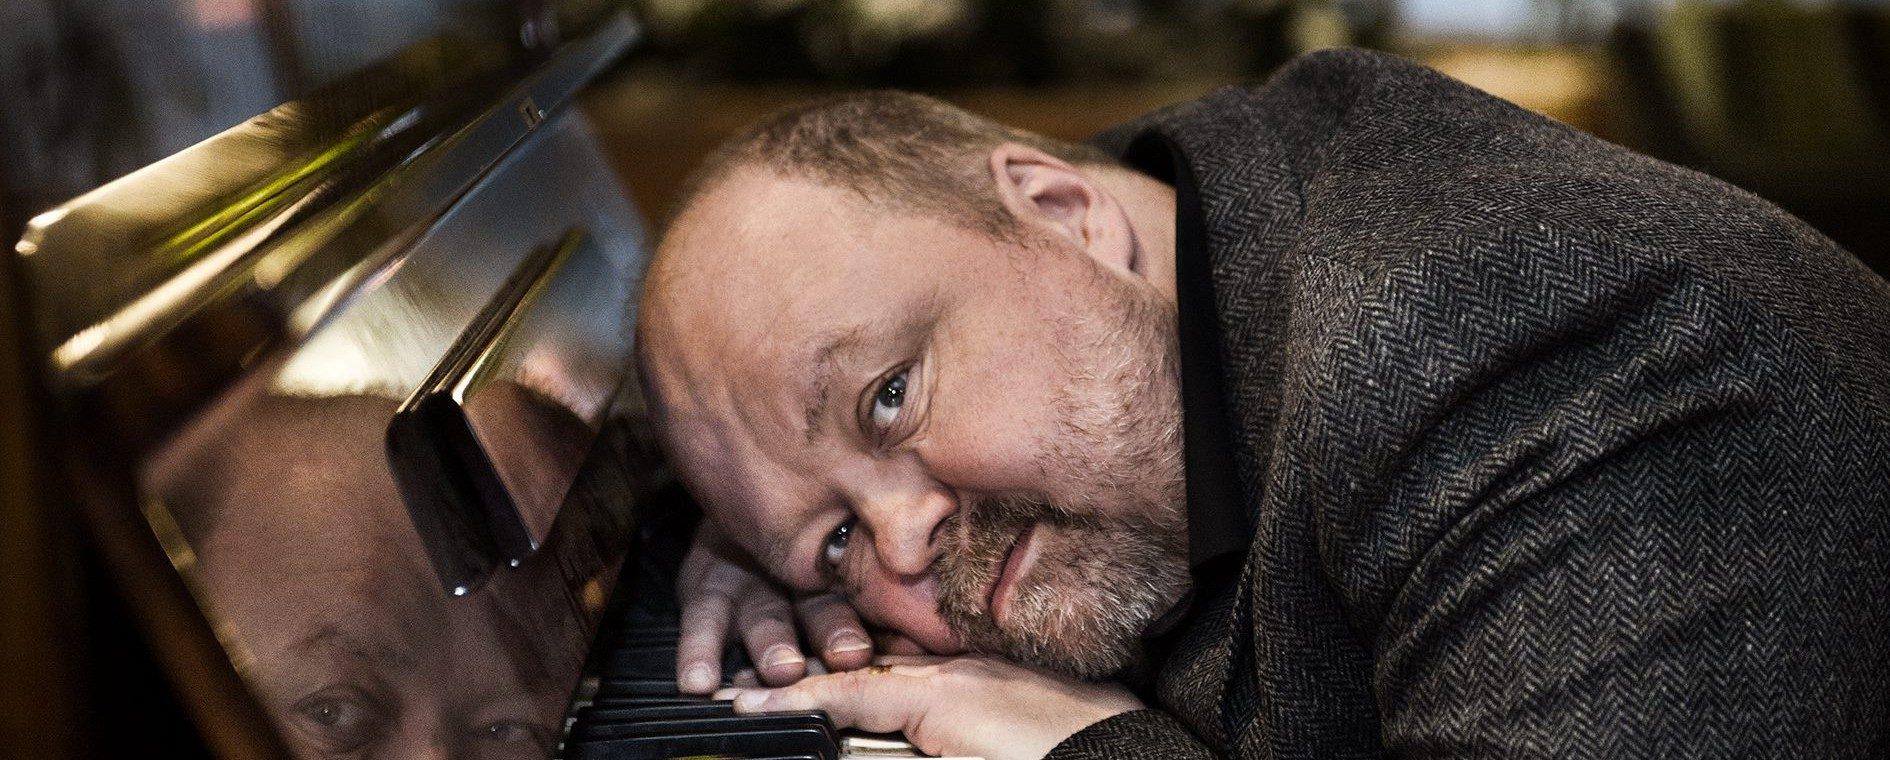 Kalle Moraeus om livet efter skilsmässan: